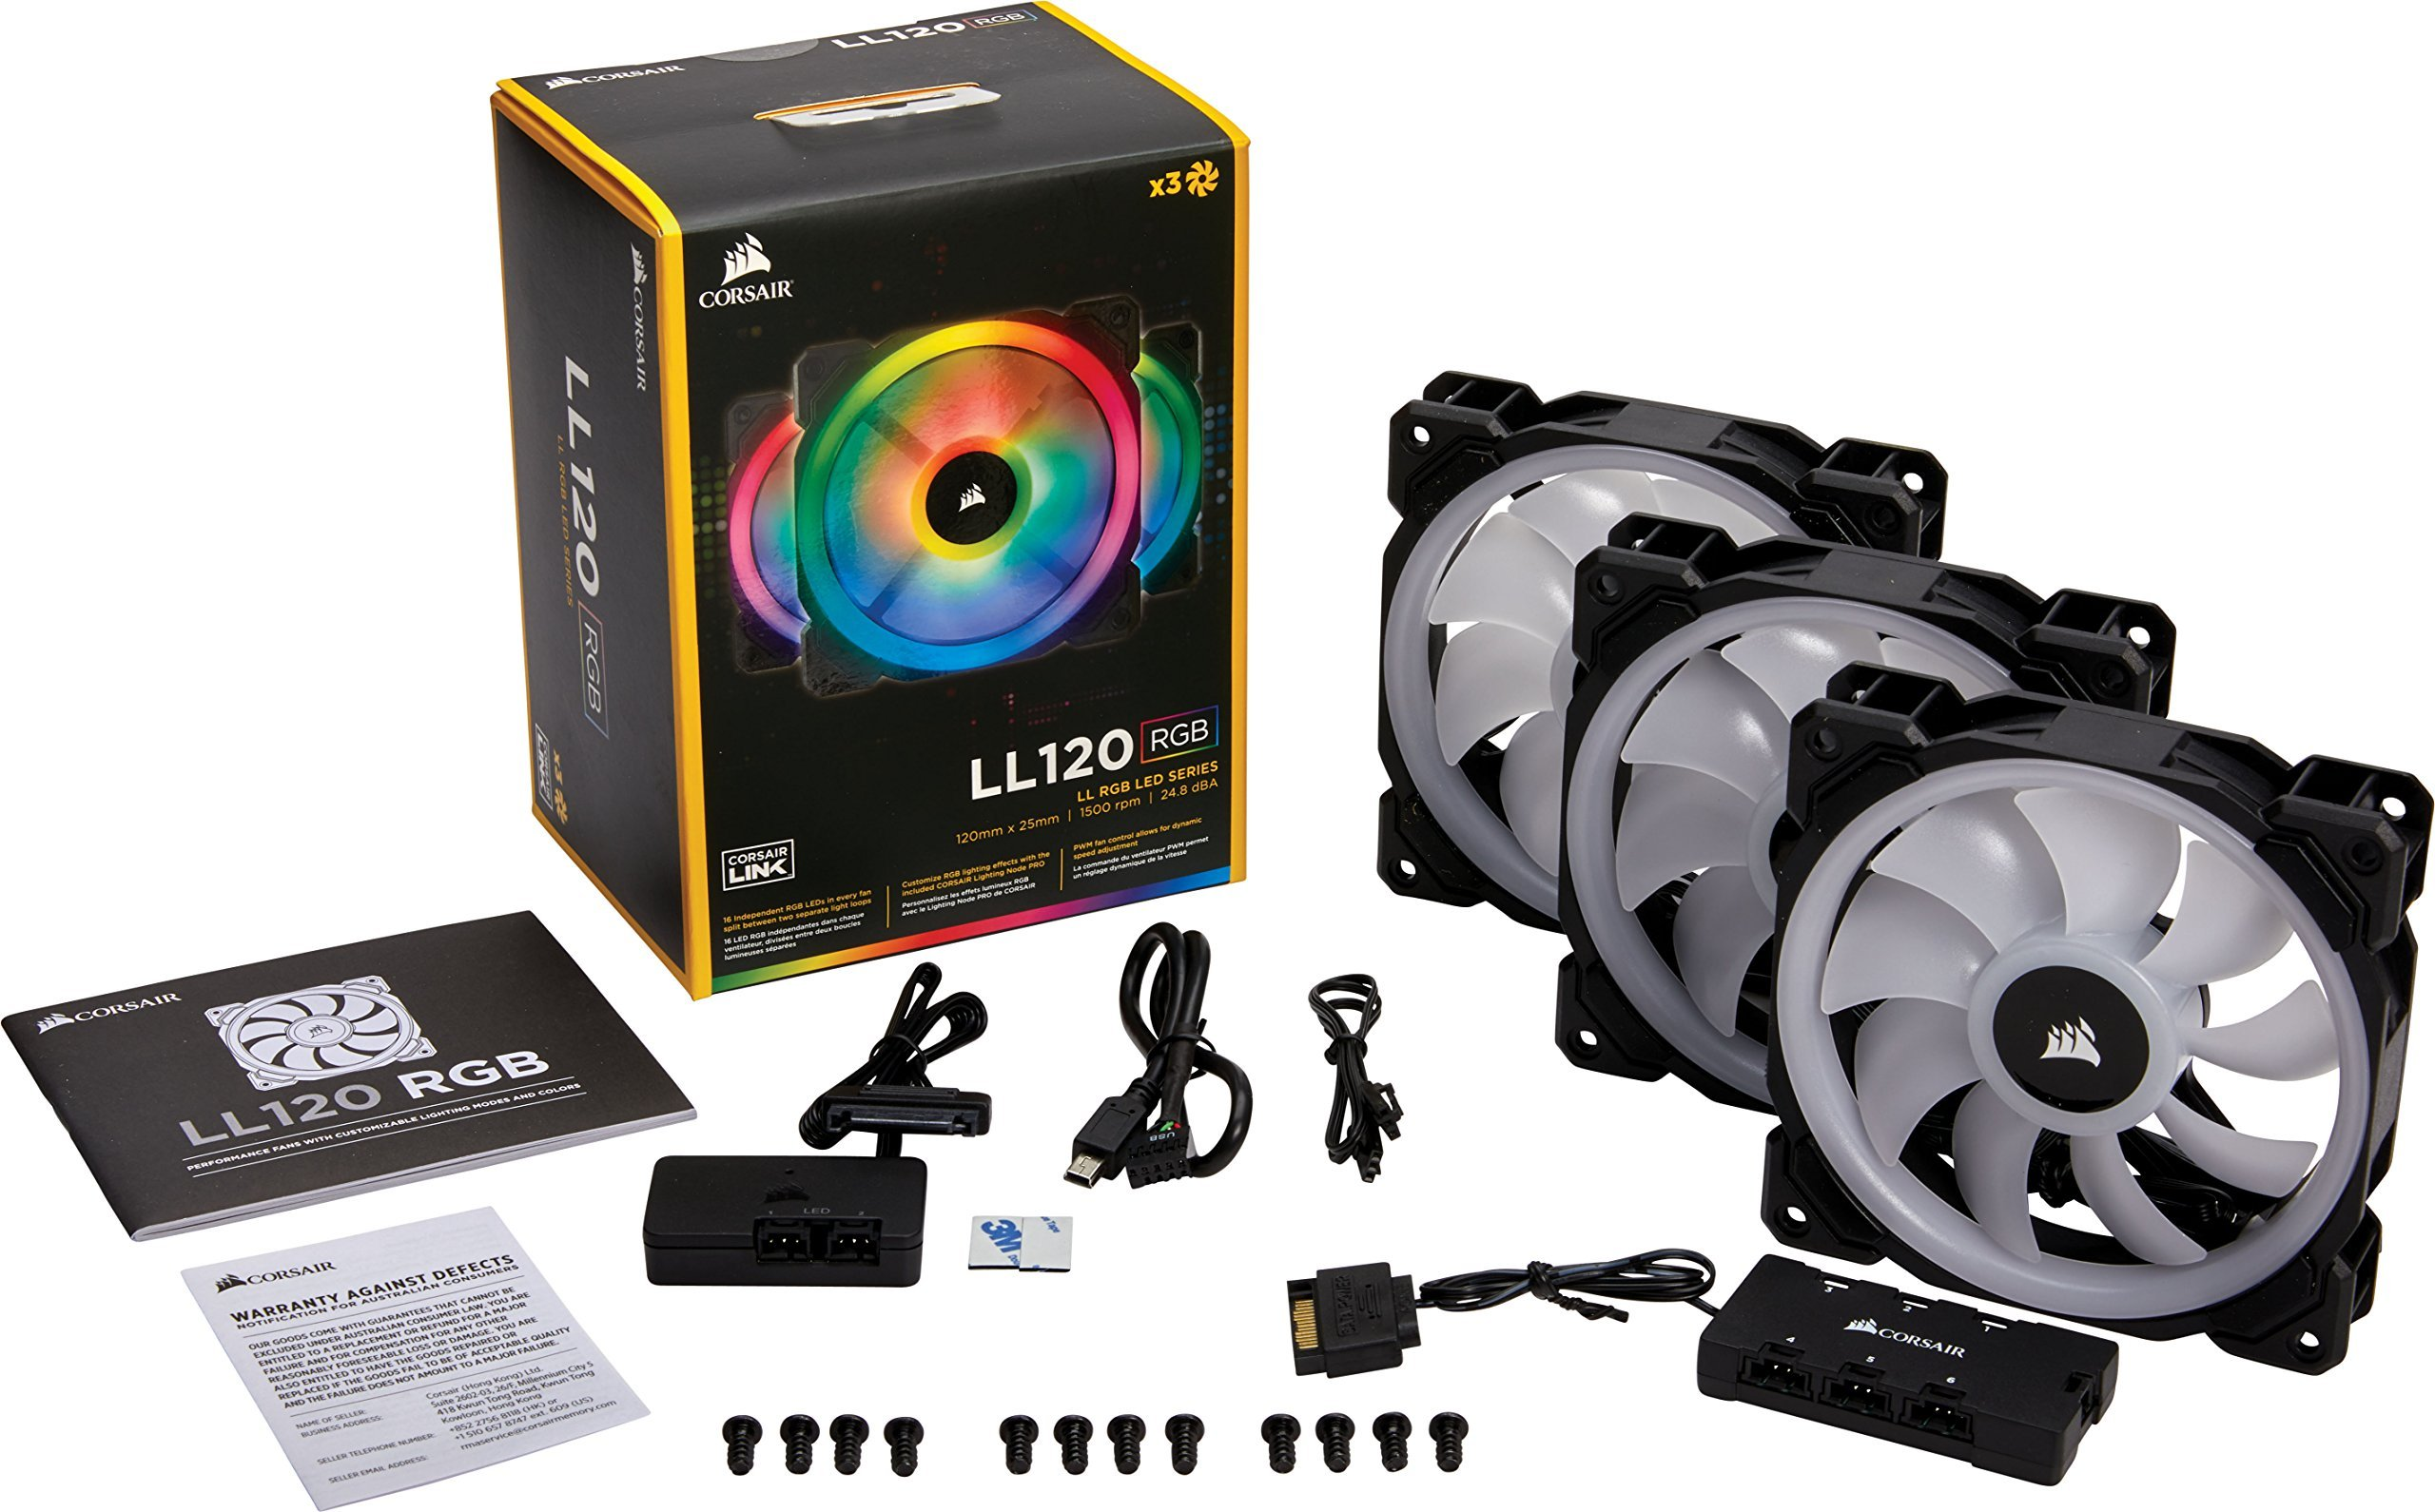 Corsair LL Series LL120 RGB 120mm Dual Light Loop RGB LED PWM Fan 3 Fan Pack with Lighting Node Pro (Renewed) by Corsair (Image #3)